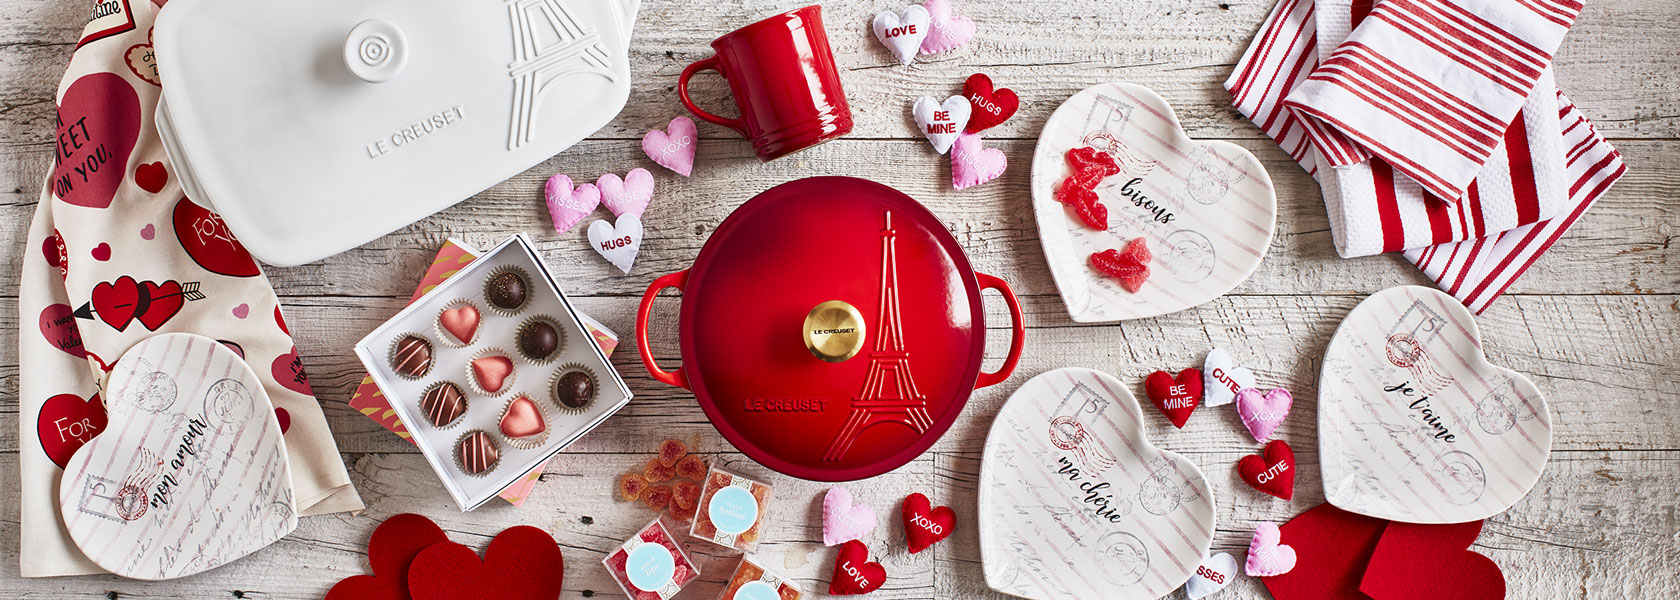 Valentine's Day cookware, dinnerware and decor.